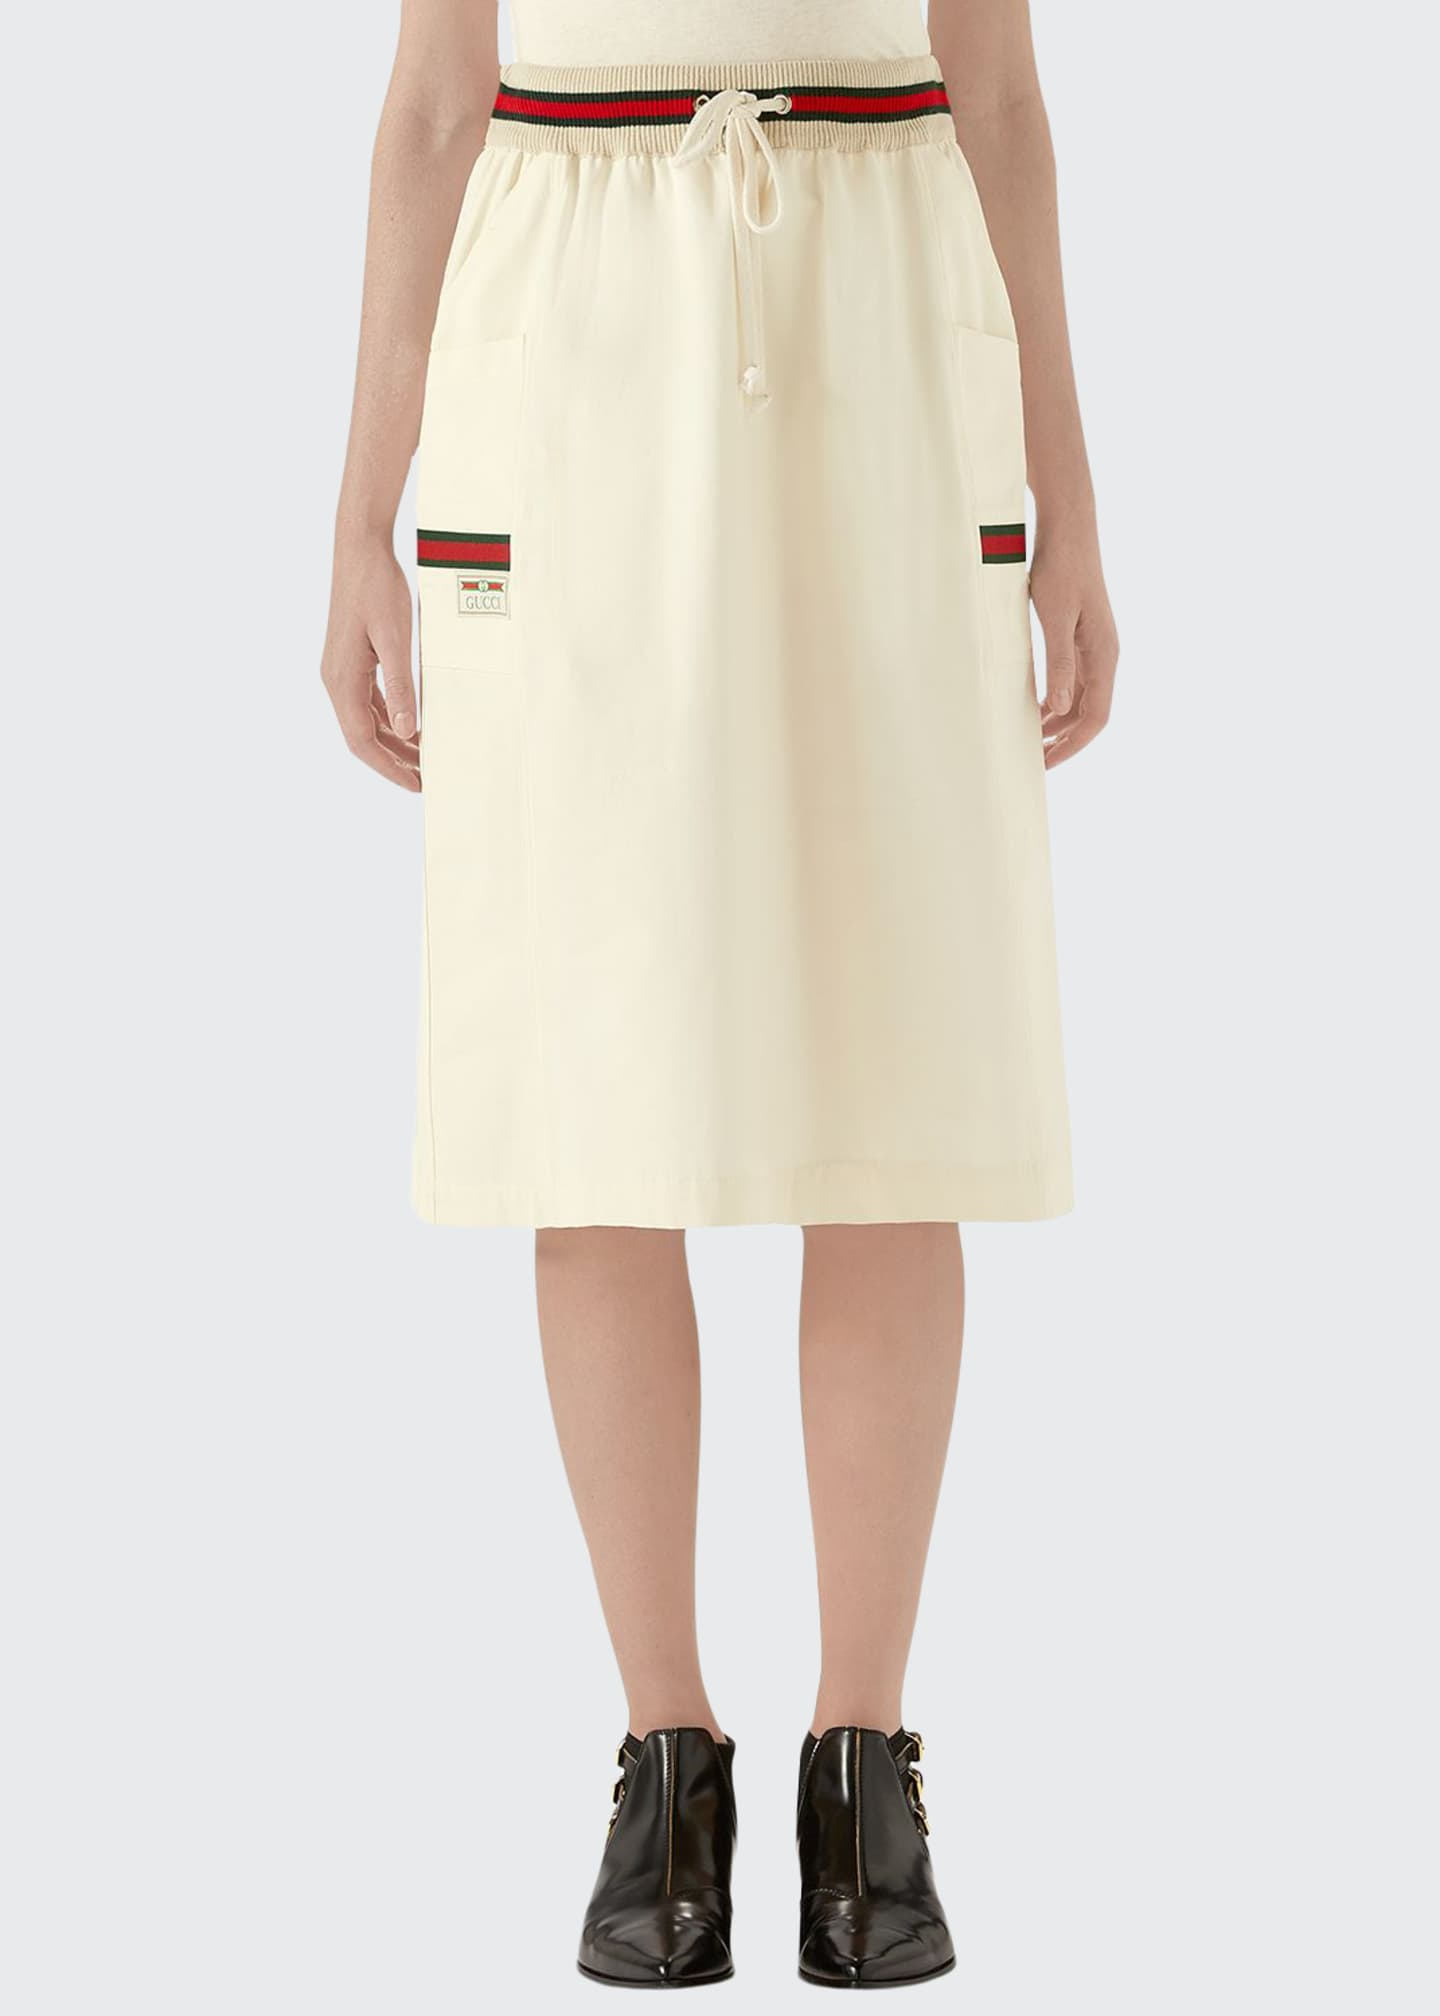 Gucci Cotton Panama Drawstring Sporty Skirt